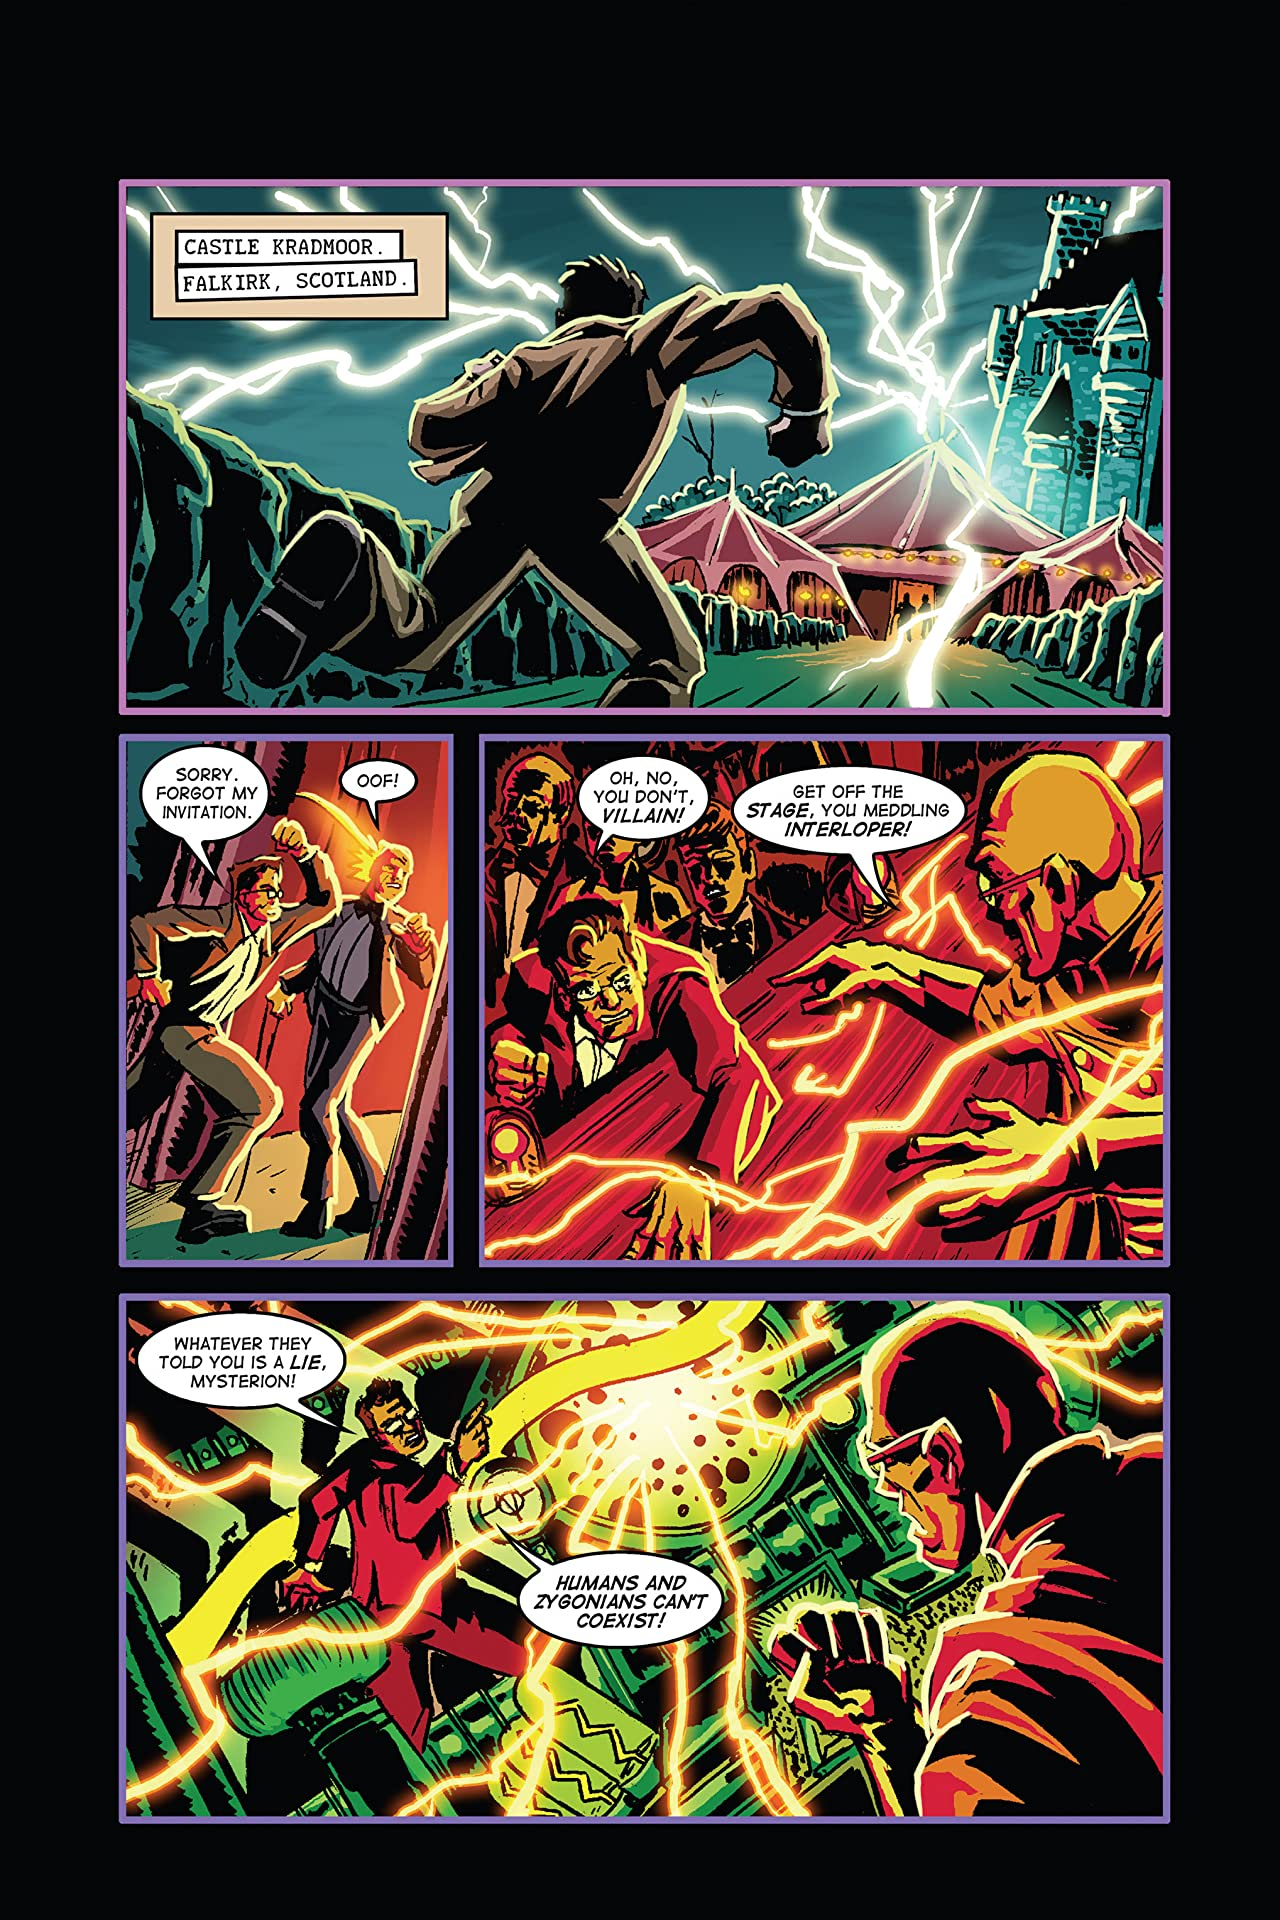 The Intergalactic Nemesis #2